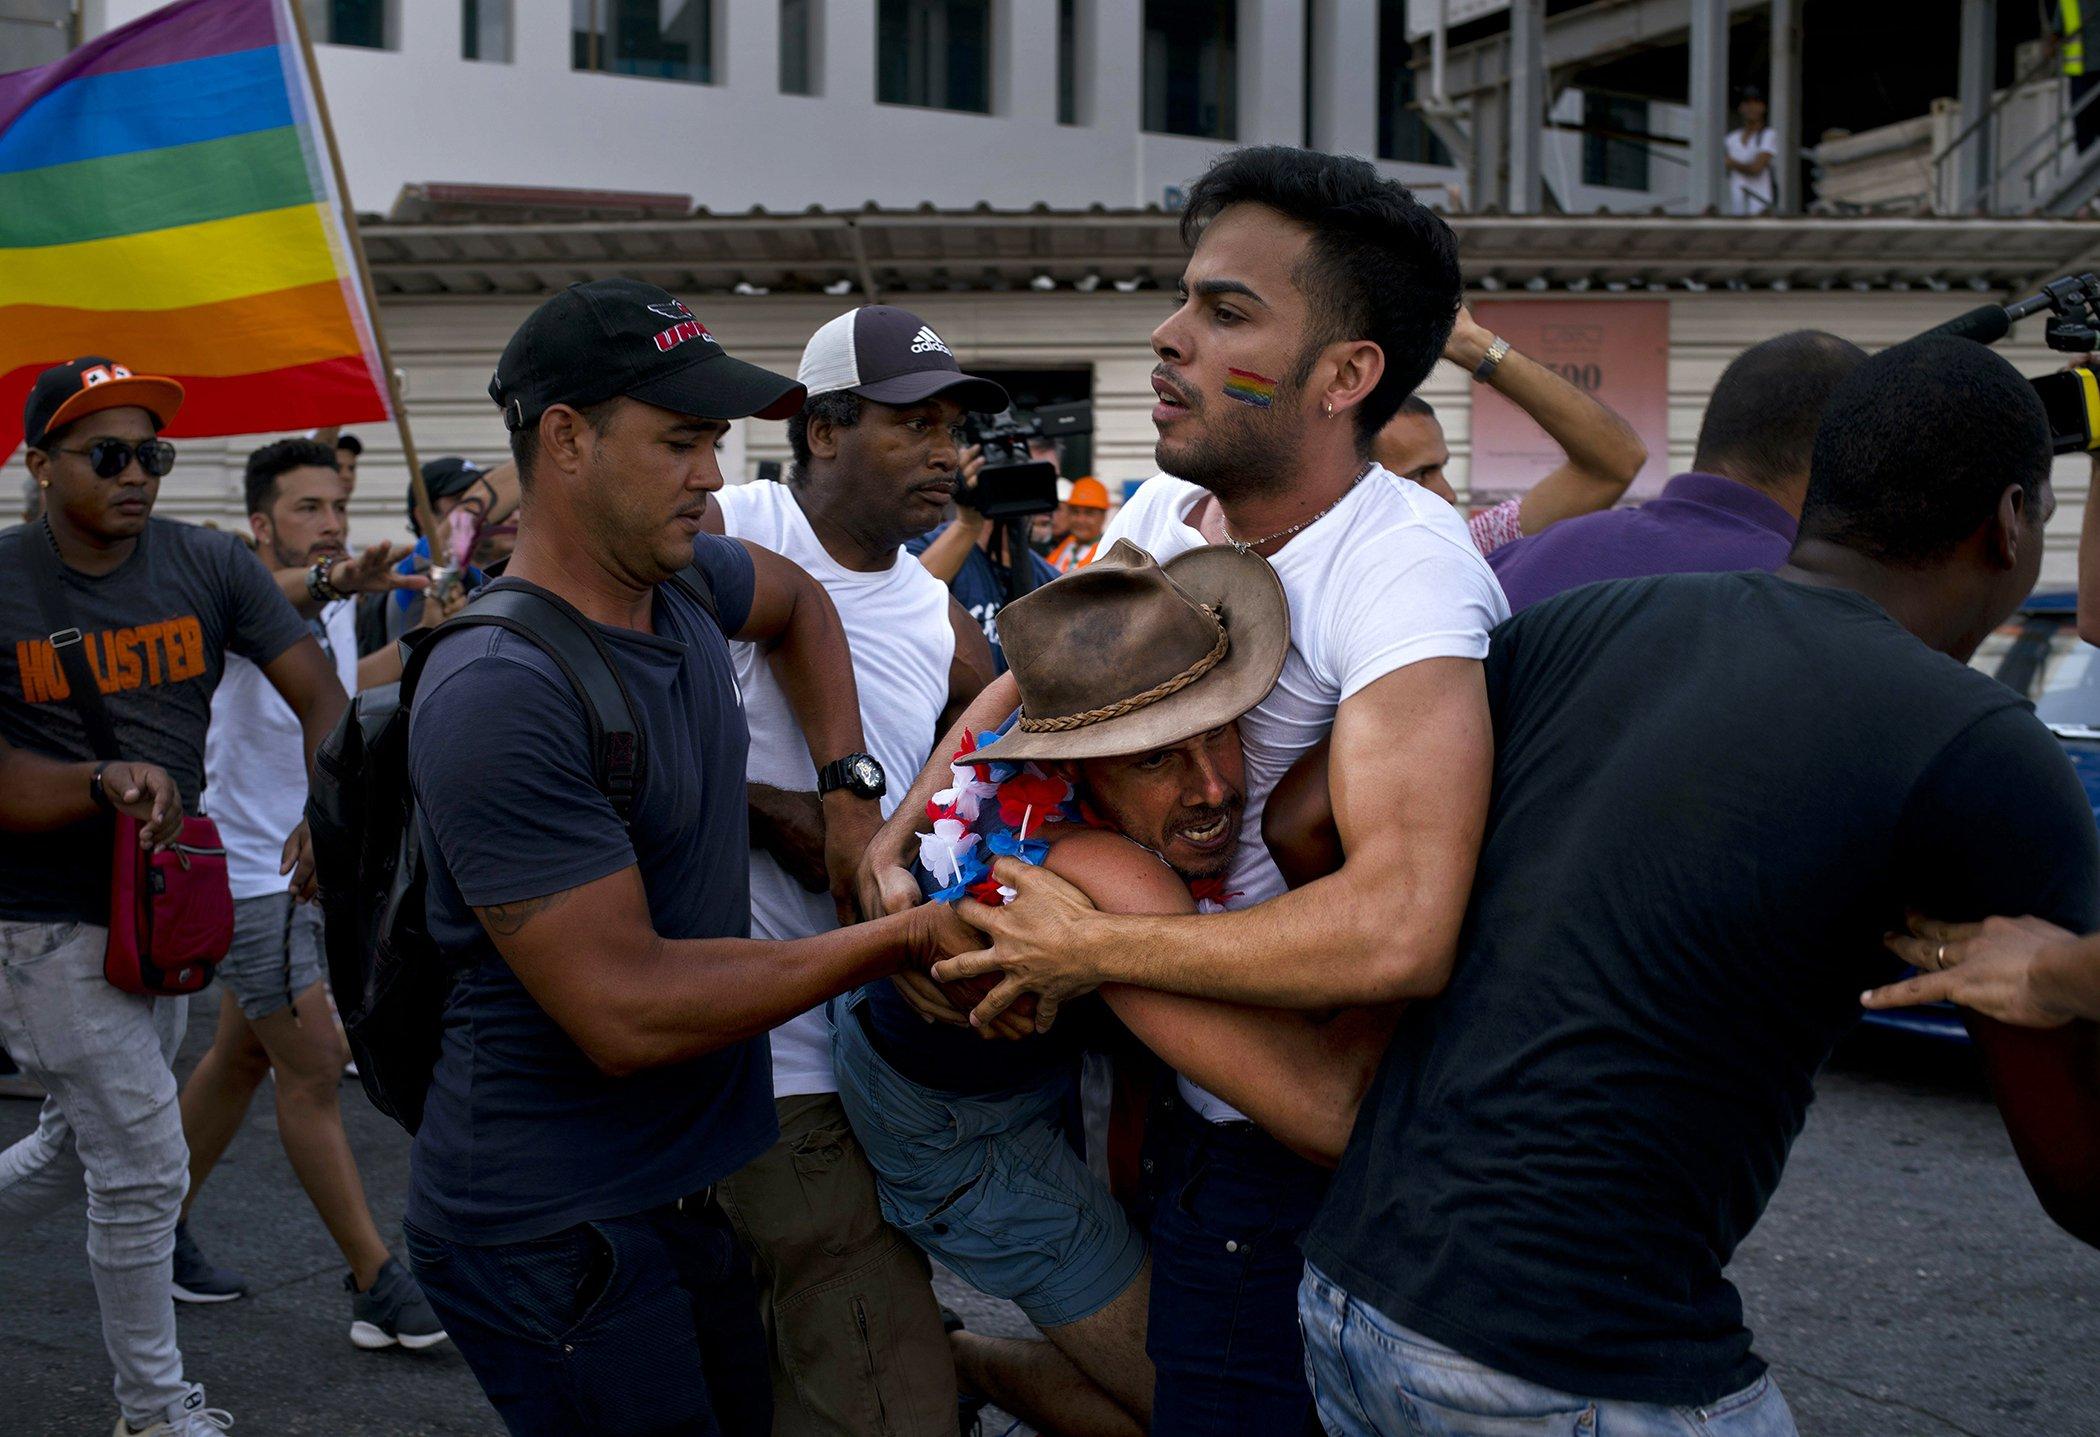 Cuba-LGBT-Parade-001.jpg